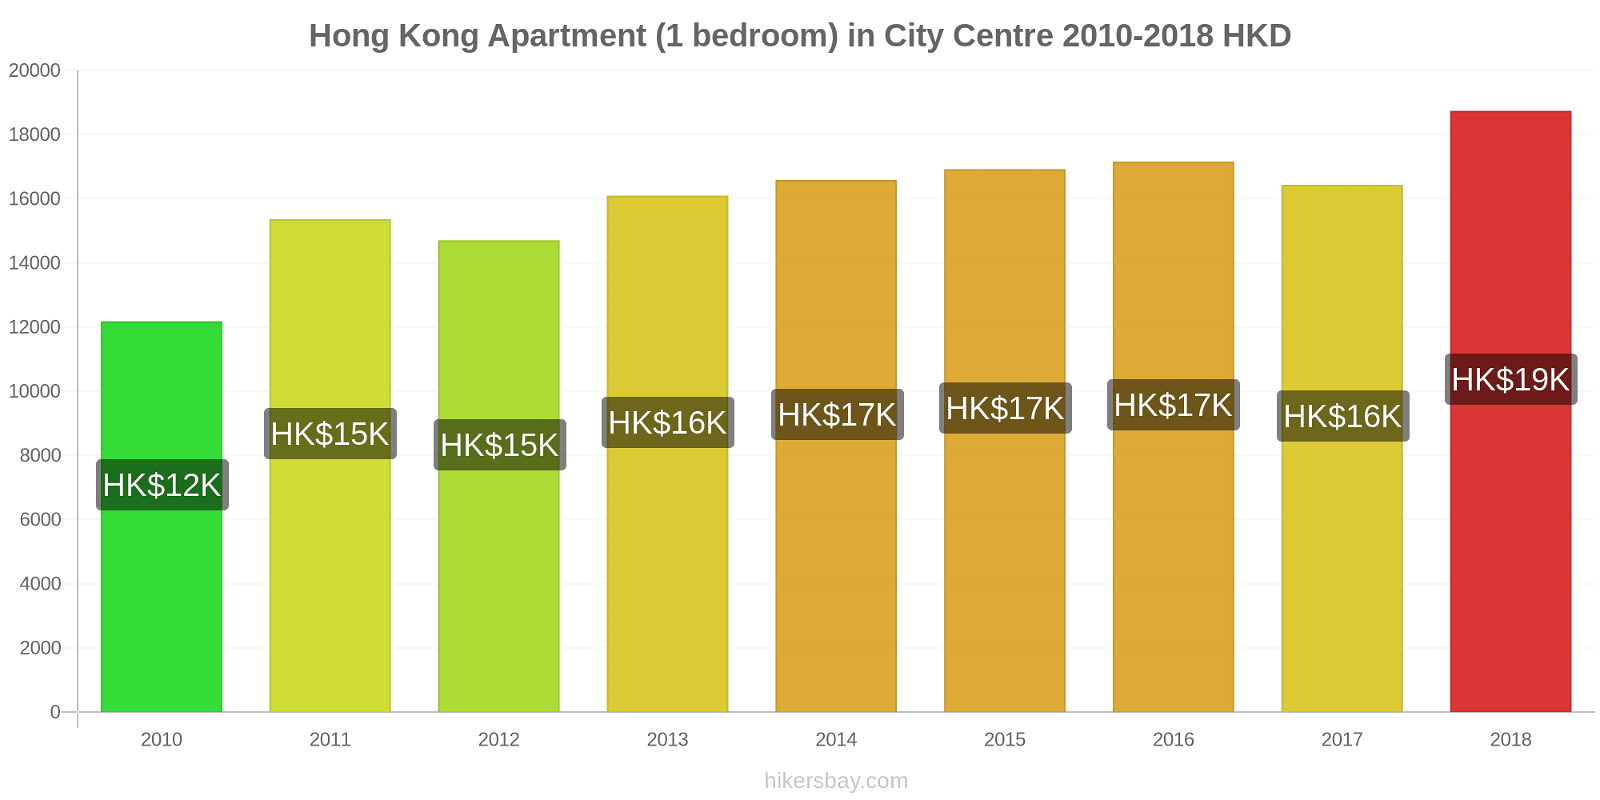 Hong Kong price changes Apartment (1 bedroom) in City Centre hikersbay.com